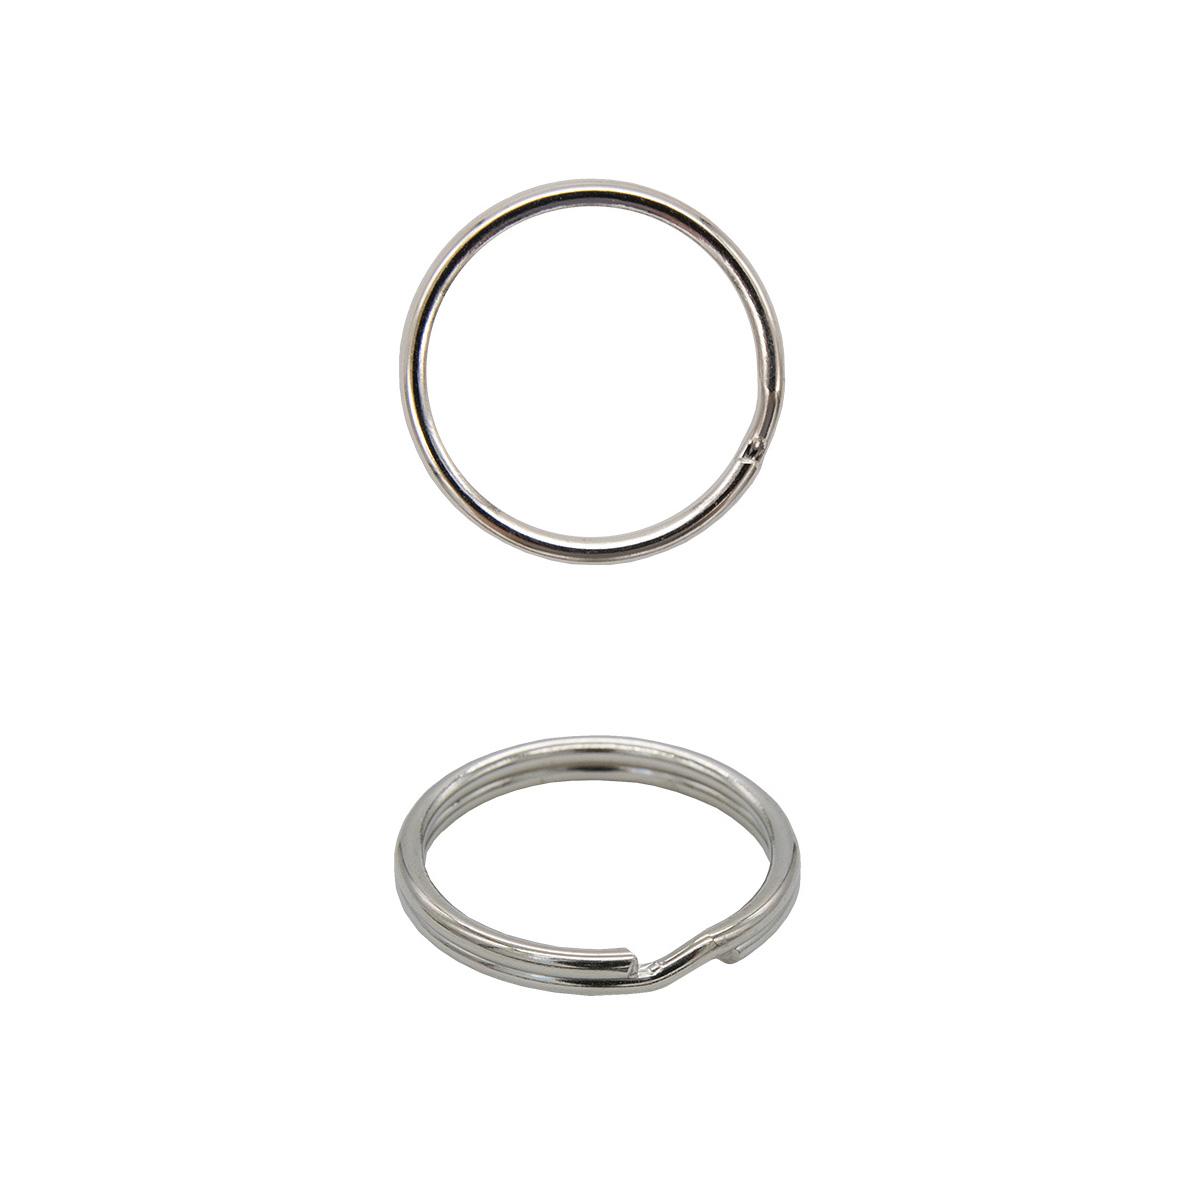 815-001 Кольцо для ключей, никель, 1,2*16 мм